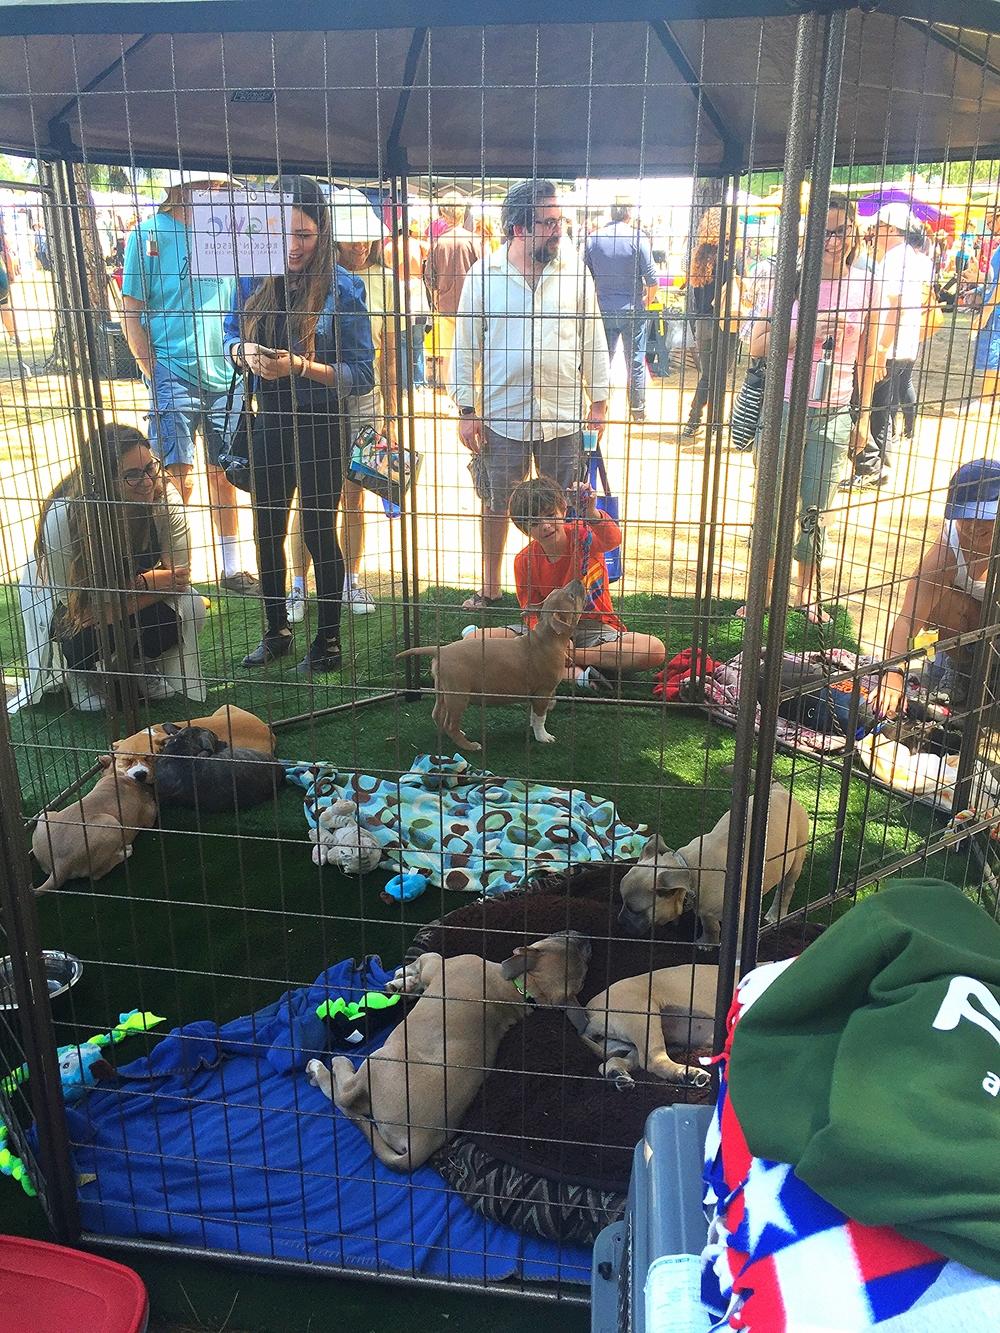 AGWC Rockin' Rescue Animal Adoption Center